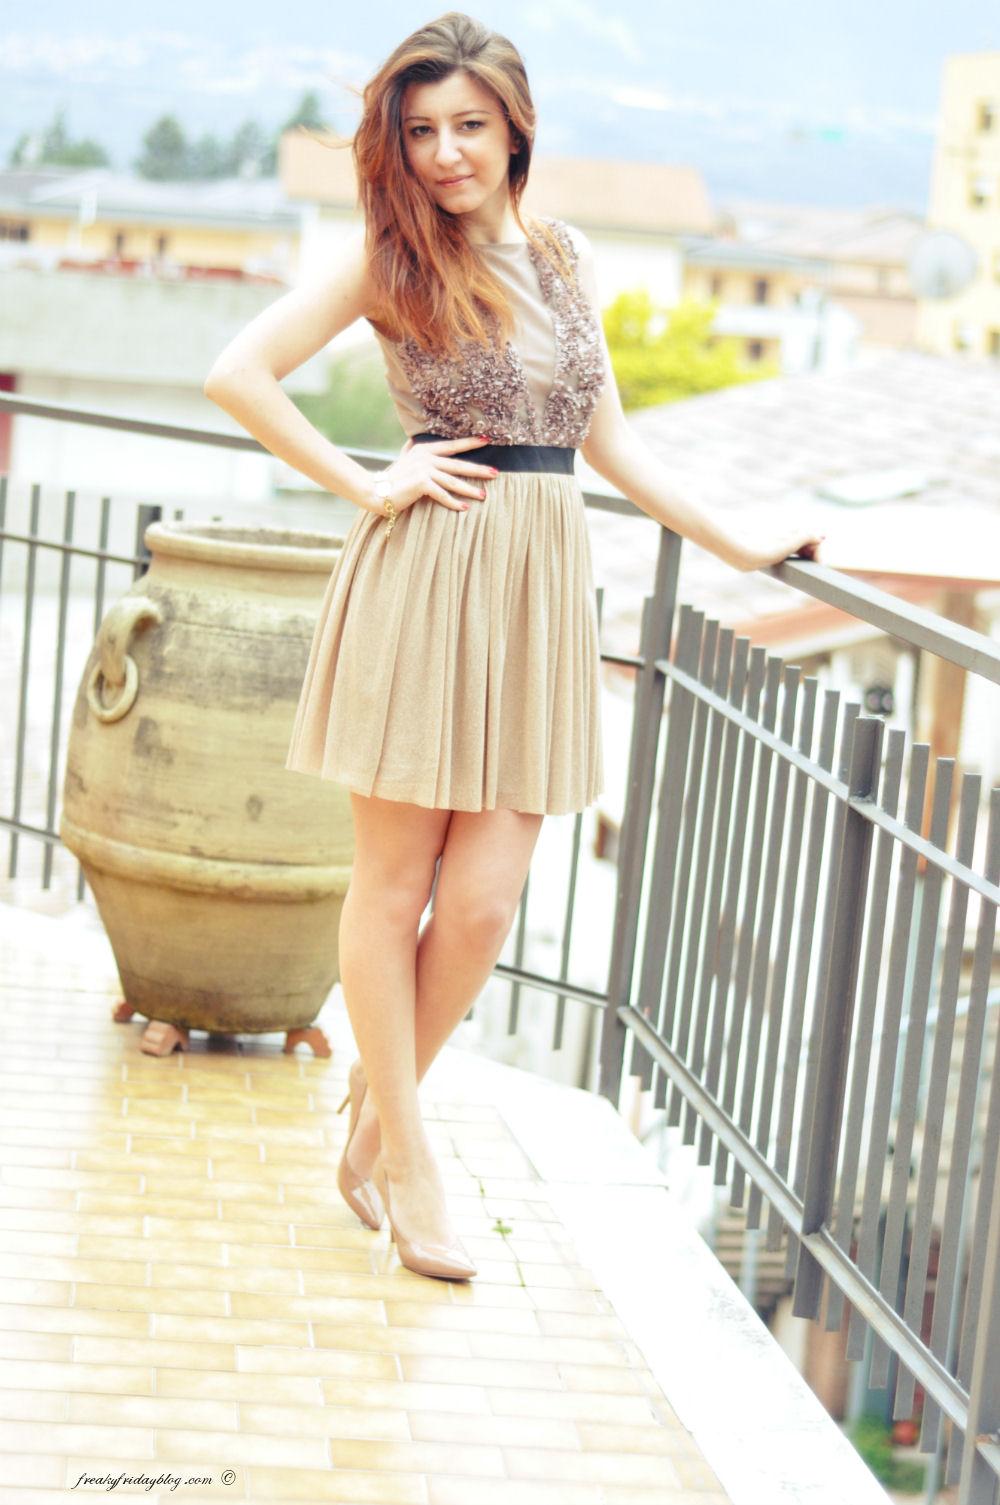 55283e842f5cf Vestiti eleganti  La Kore - Freaky Friday Fashion Blogger Sabrina Musco